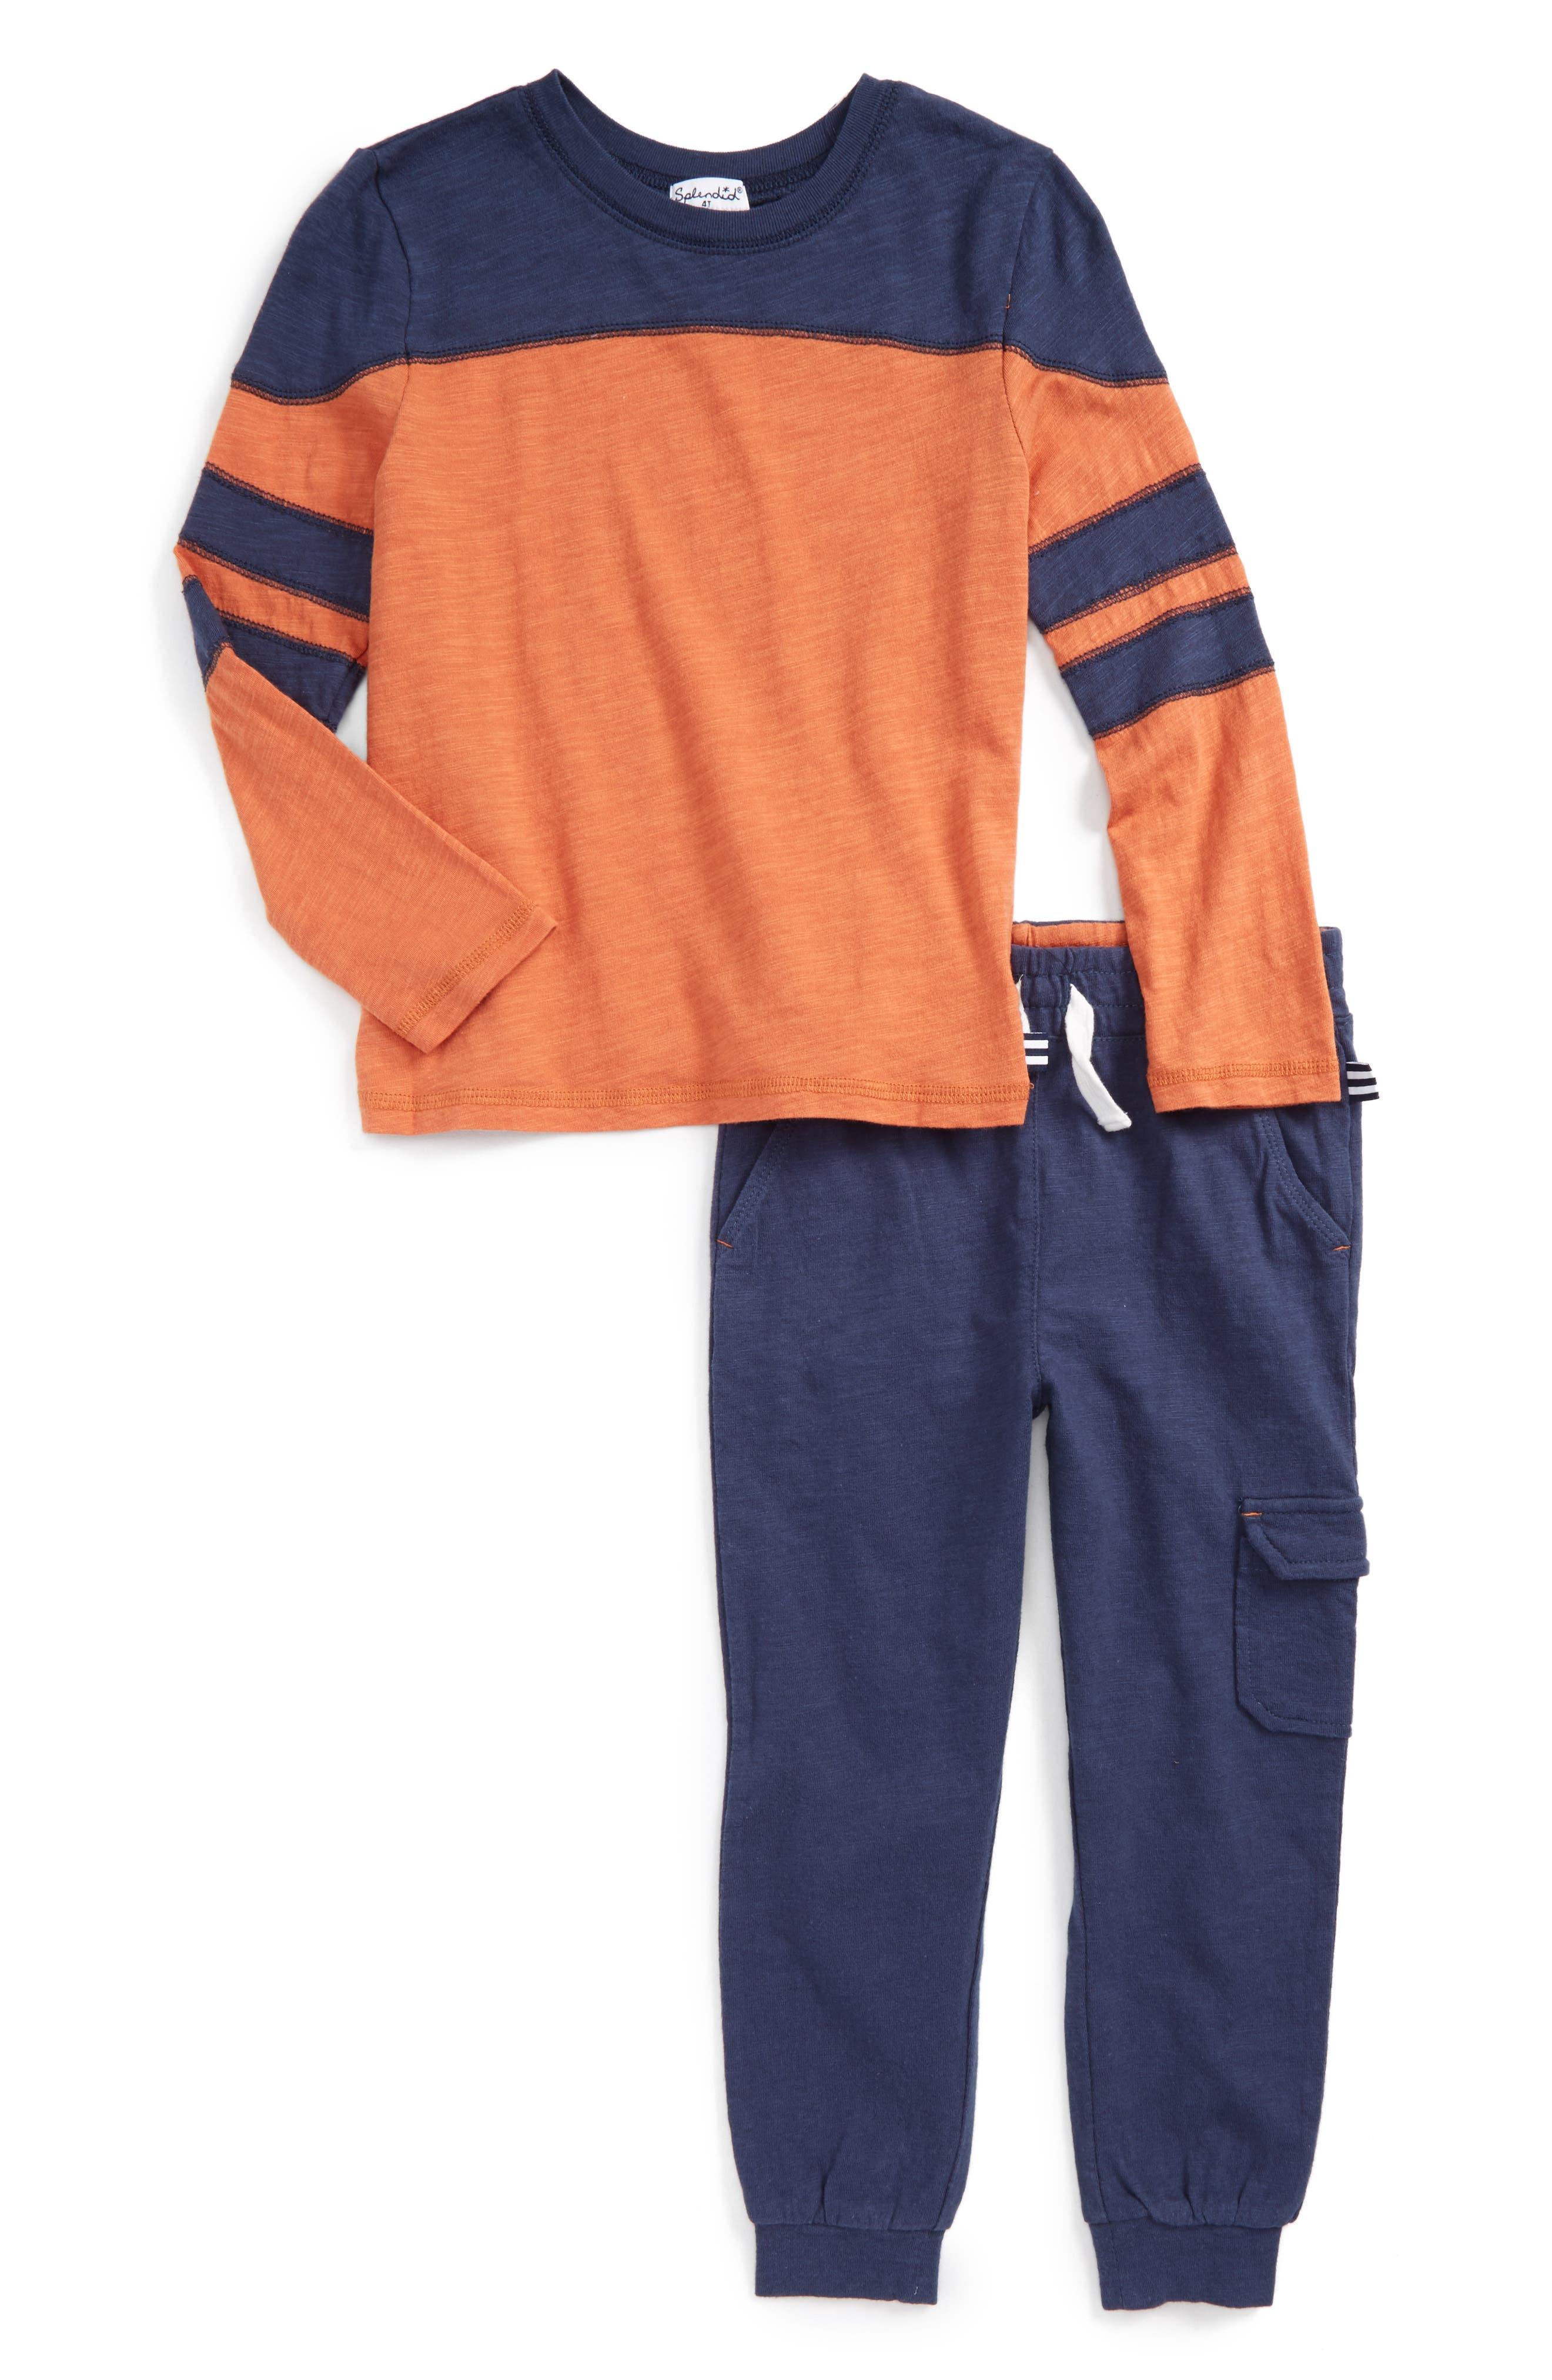 Main Image - Splendid Long Sleeve T-Shirt & Jogger Pants (Toddler Boys & Little Boys)